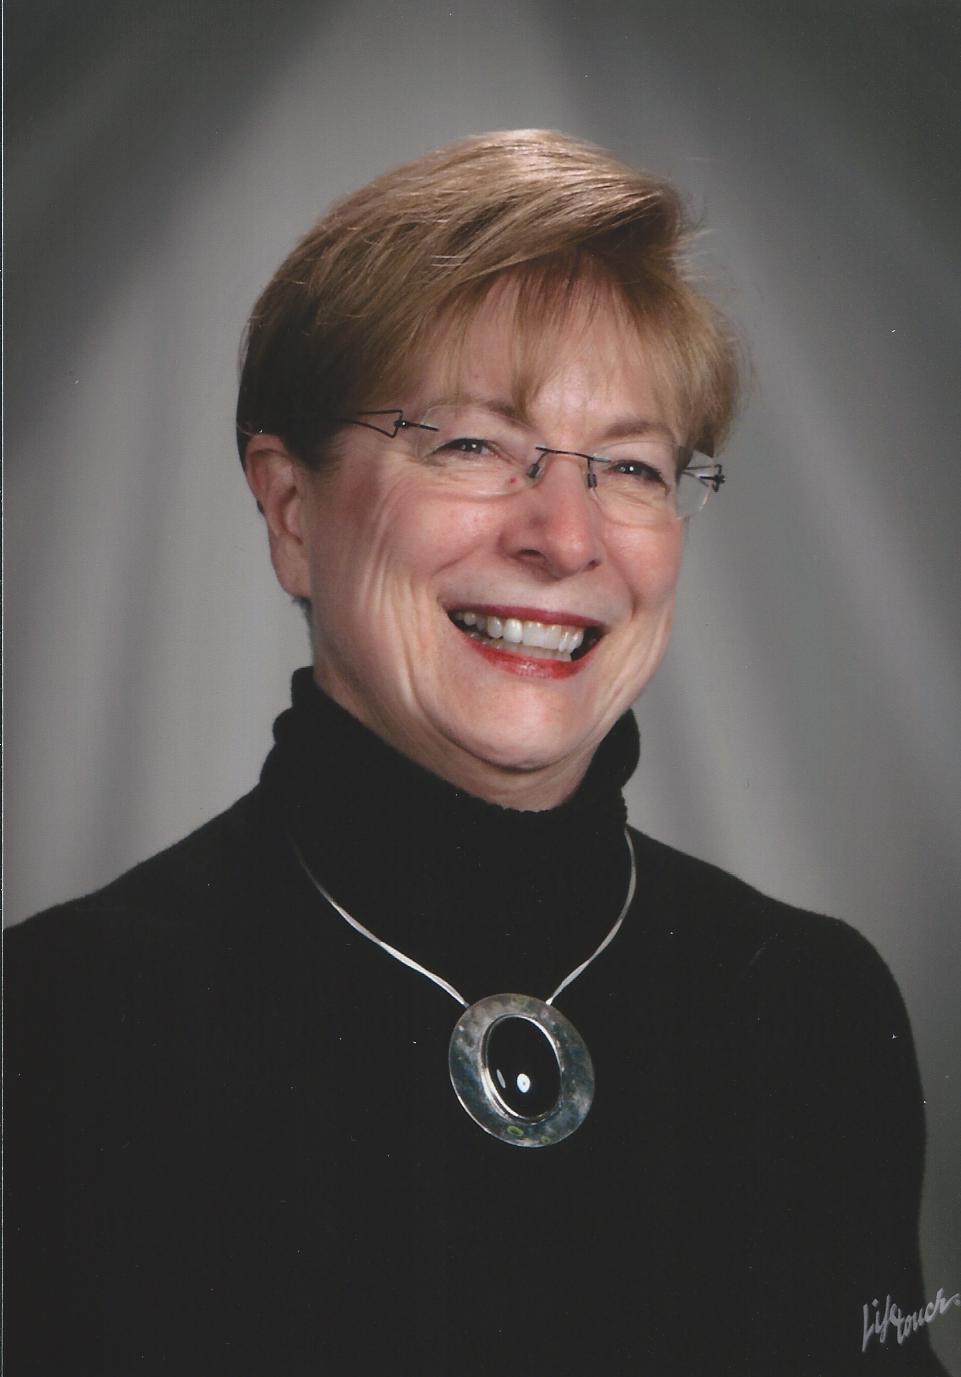 Heritage Steward: Marjorie Kienle